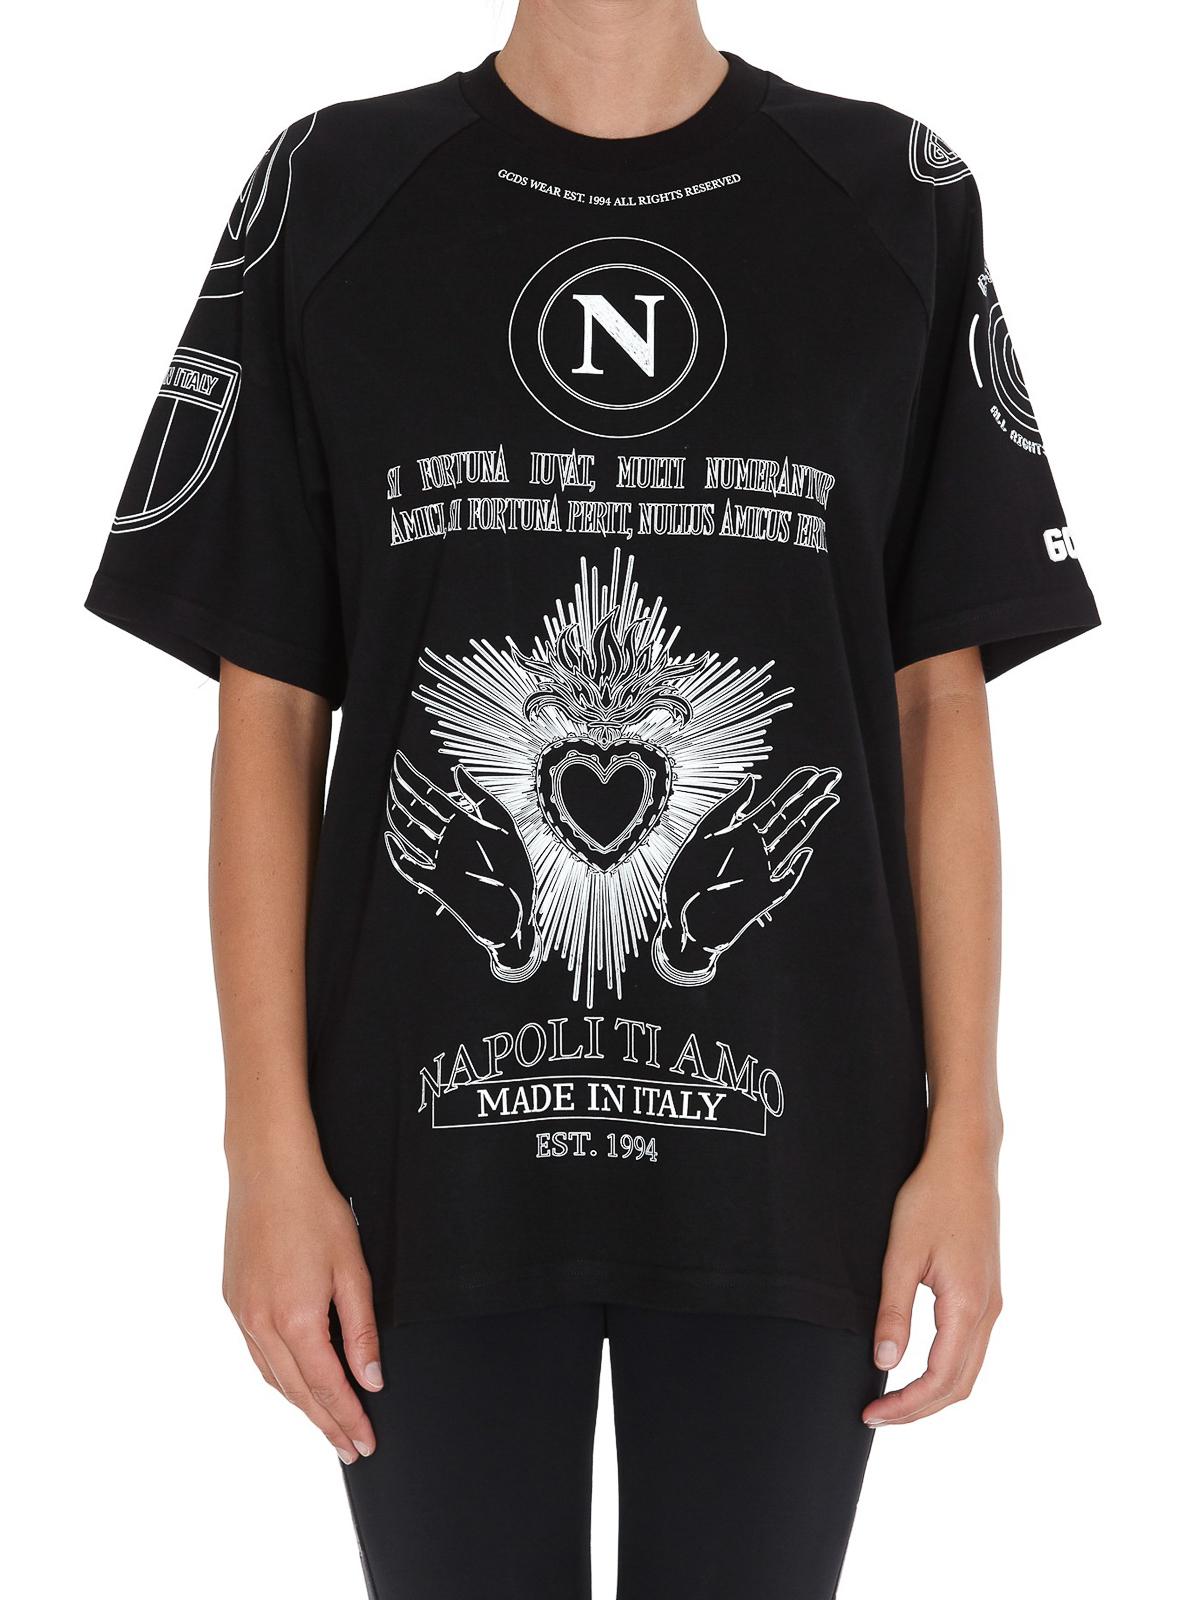 SSC Napoli Raglan Tee Gcds Unisex None X T-Shirt Erwachsene